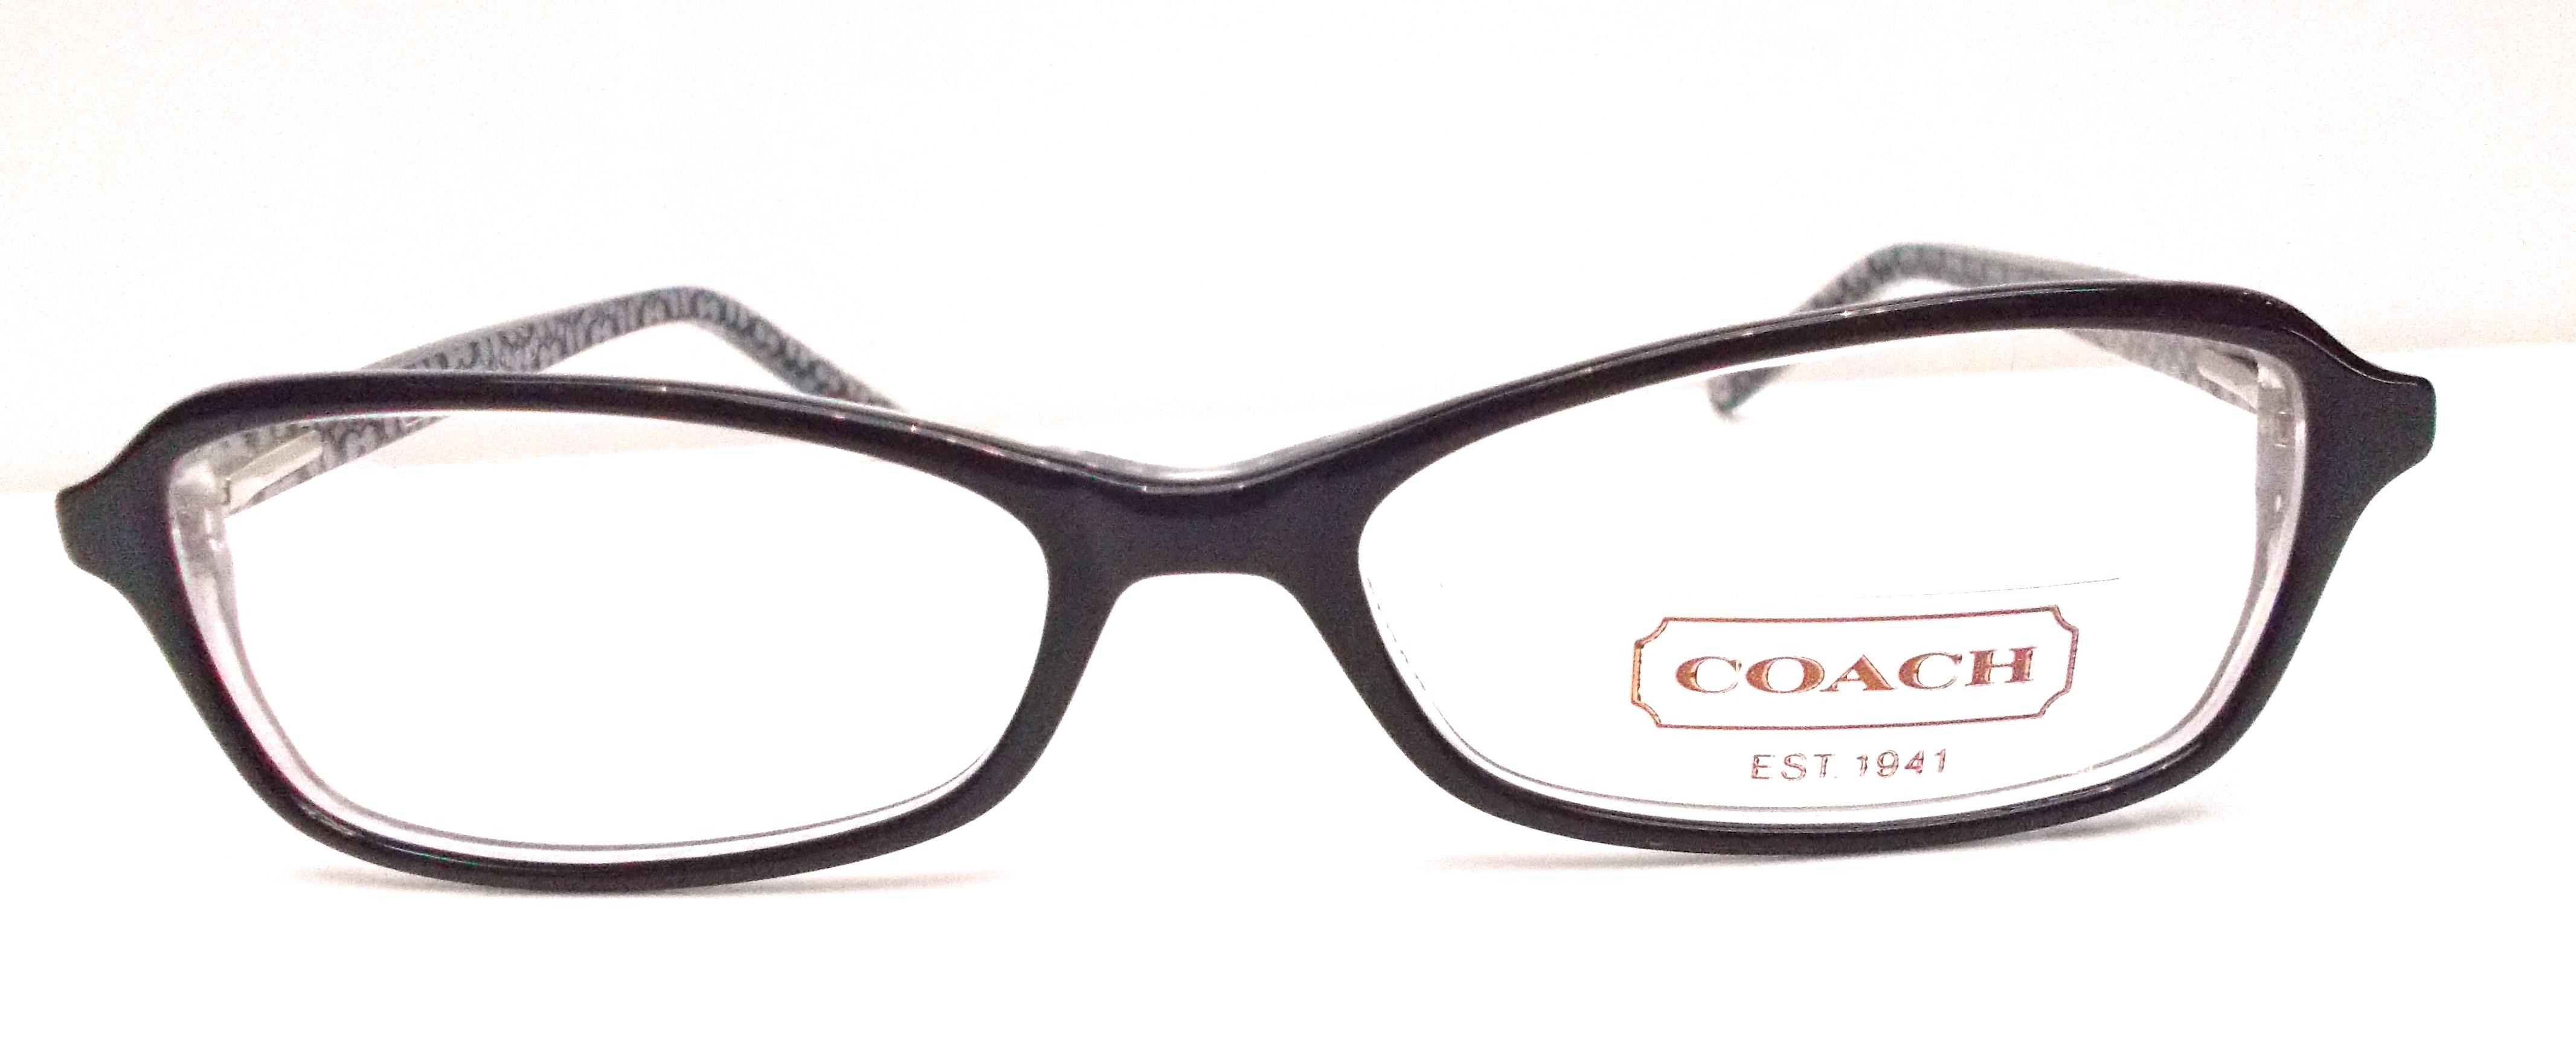 Coach Eyeglasses Lizzie 514 Black On Storenvy